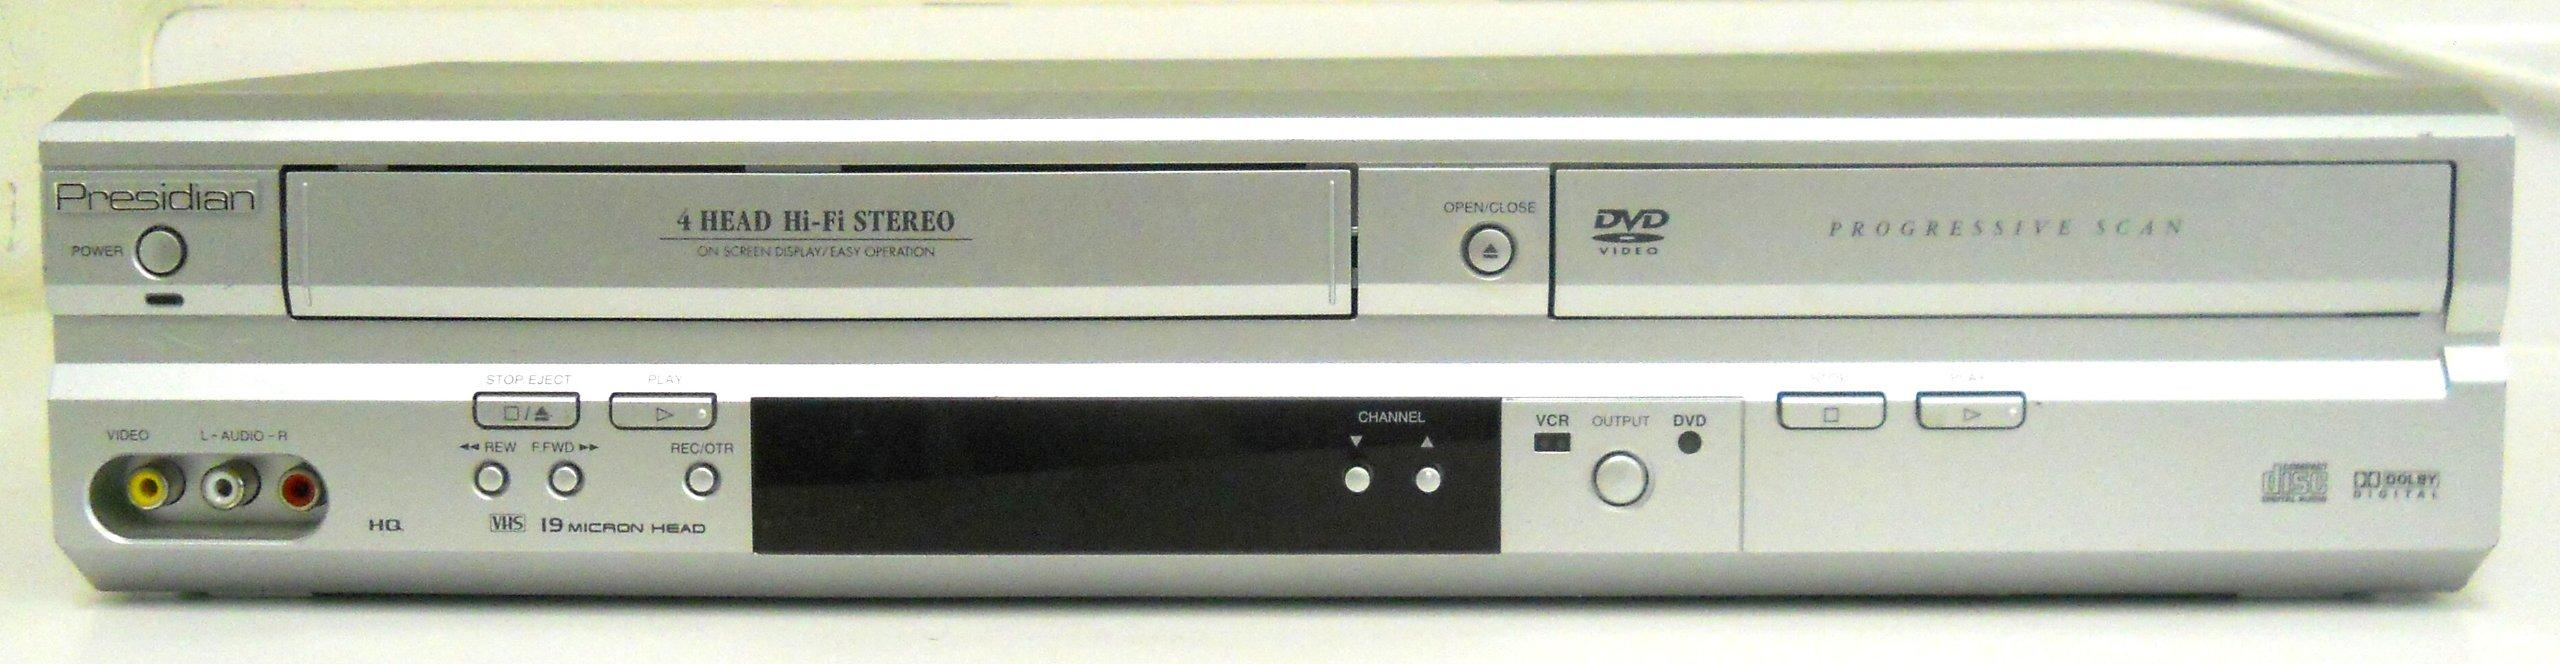 Presidian PDC-3286 DVD Player Video Cassette Recorder Player DVD/VCR Combo w/ 4 Head & Progressive Scan